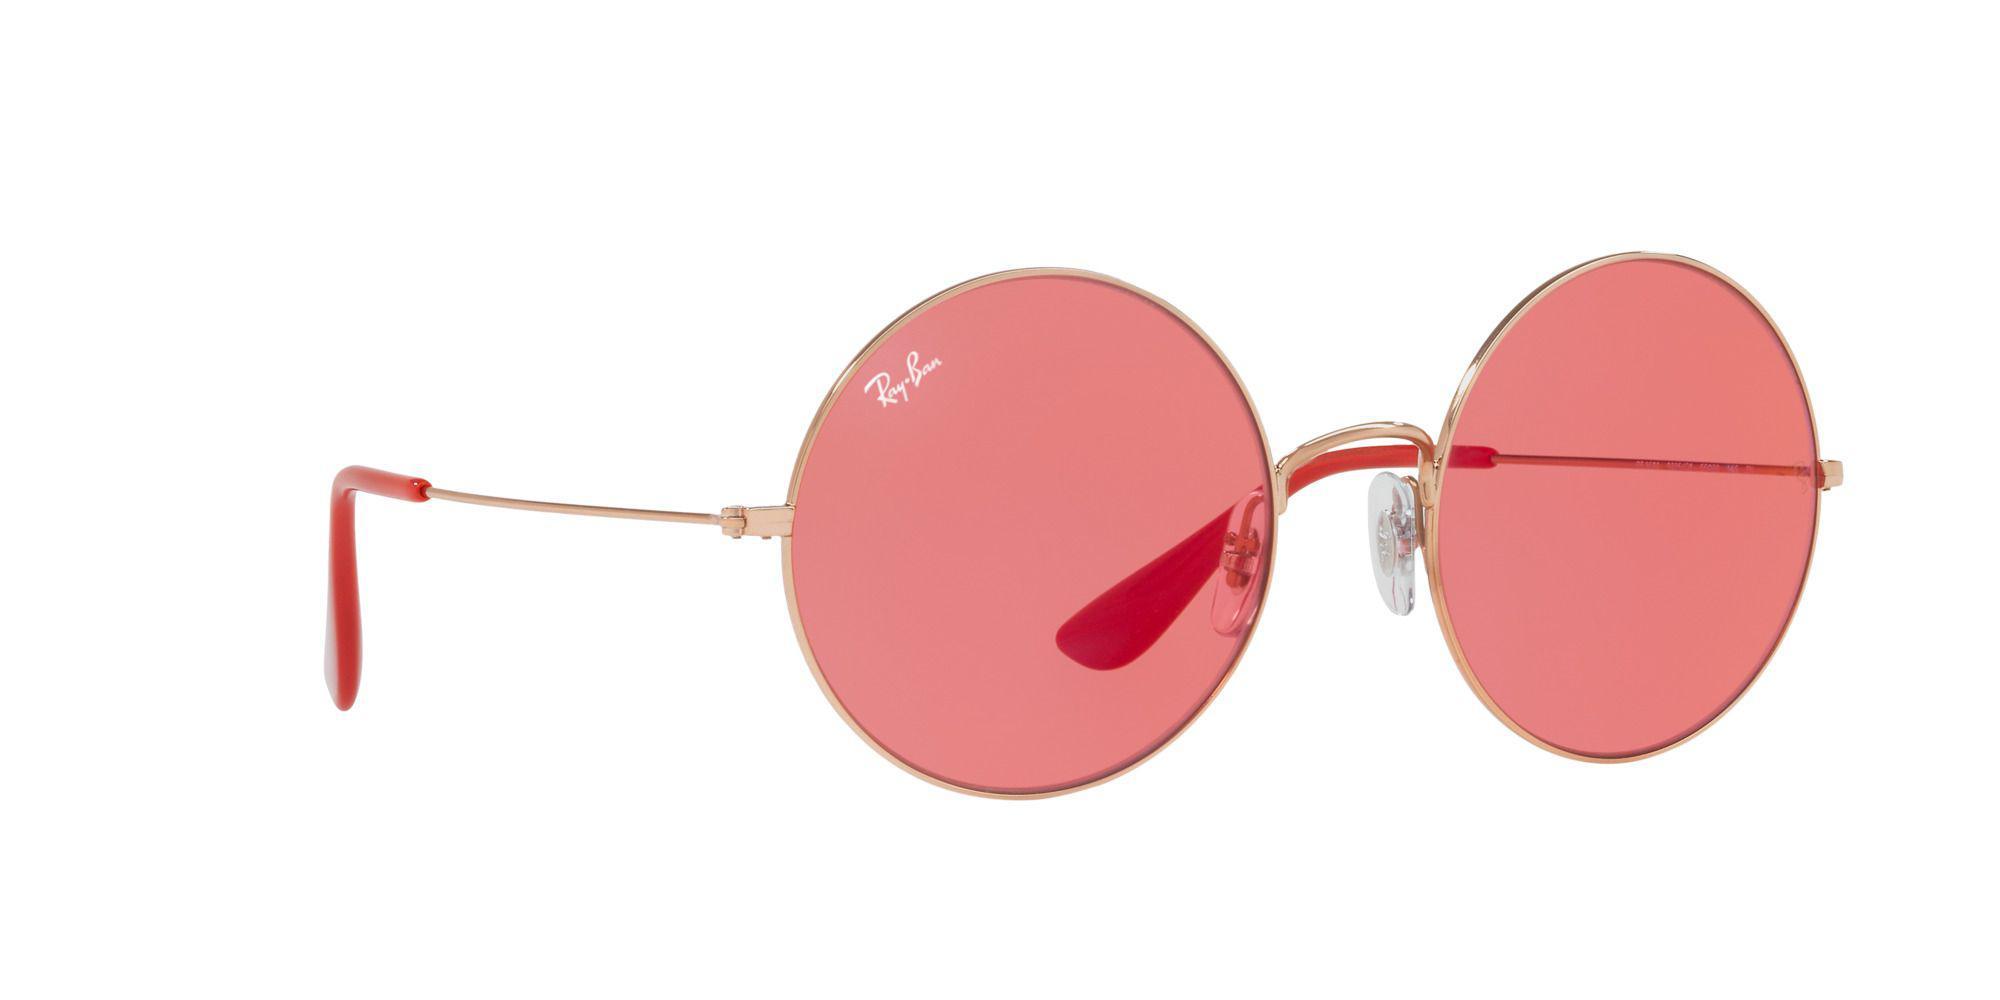 7eafac399c Ray-Ban. Women s Bronze copper Ja-jo Round Sunglasses